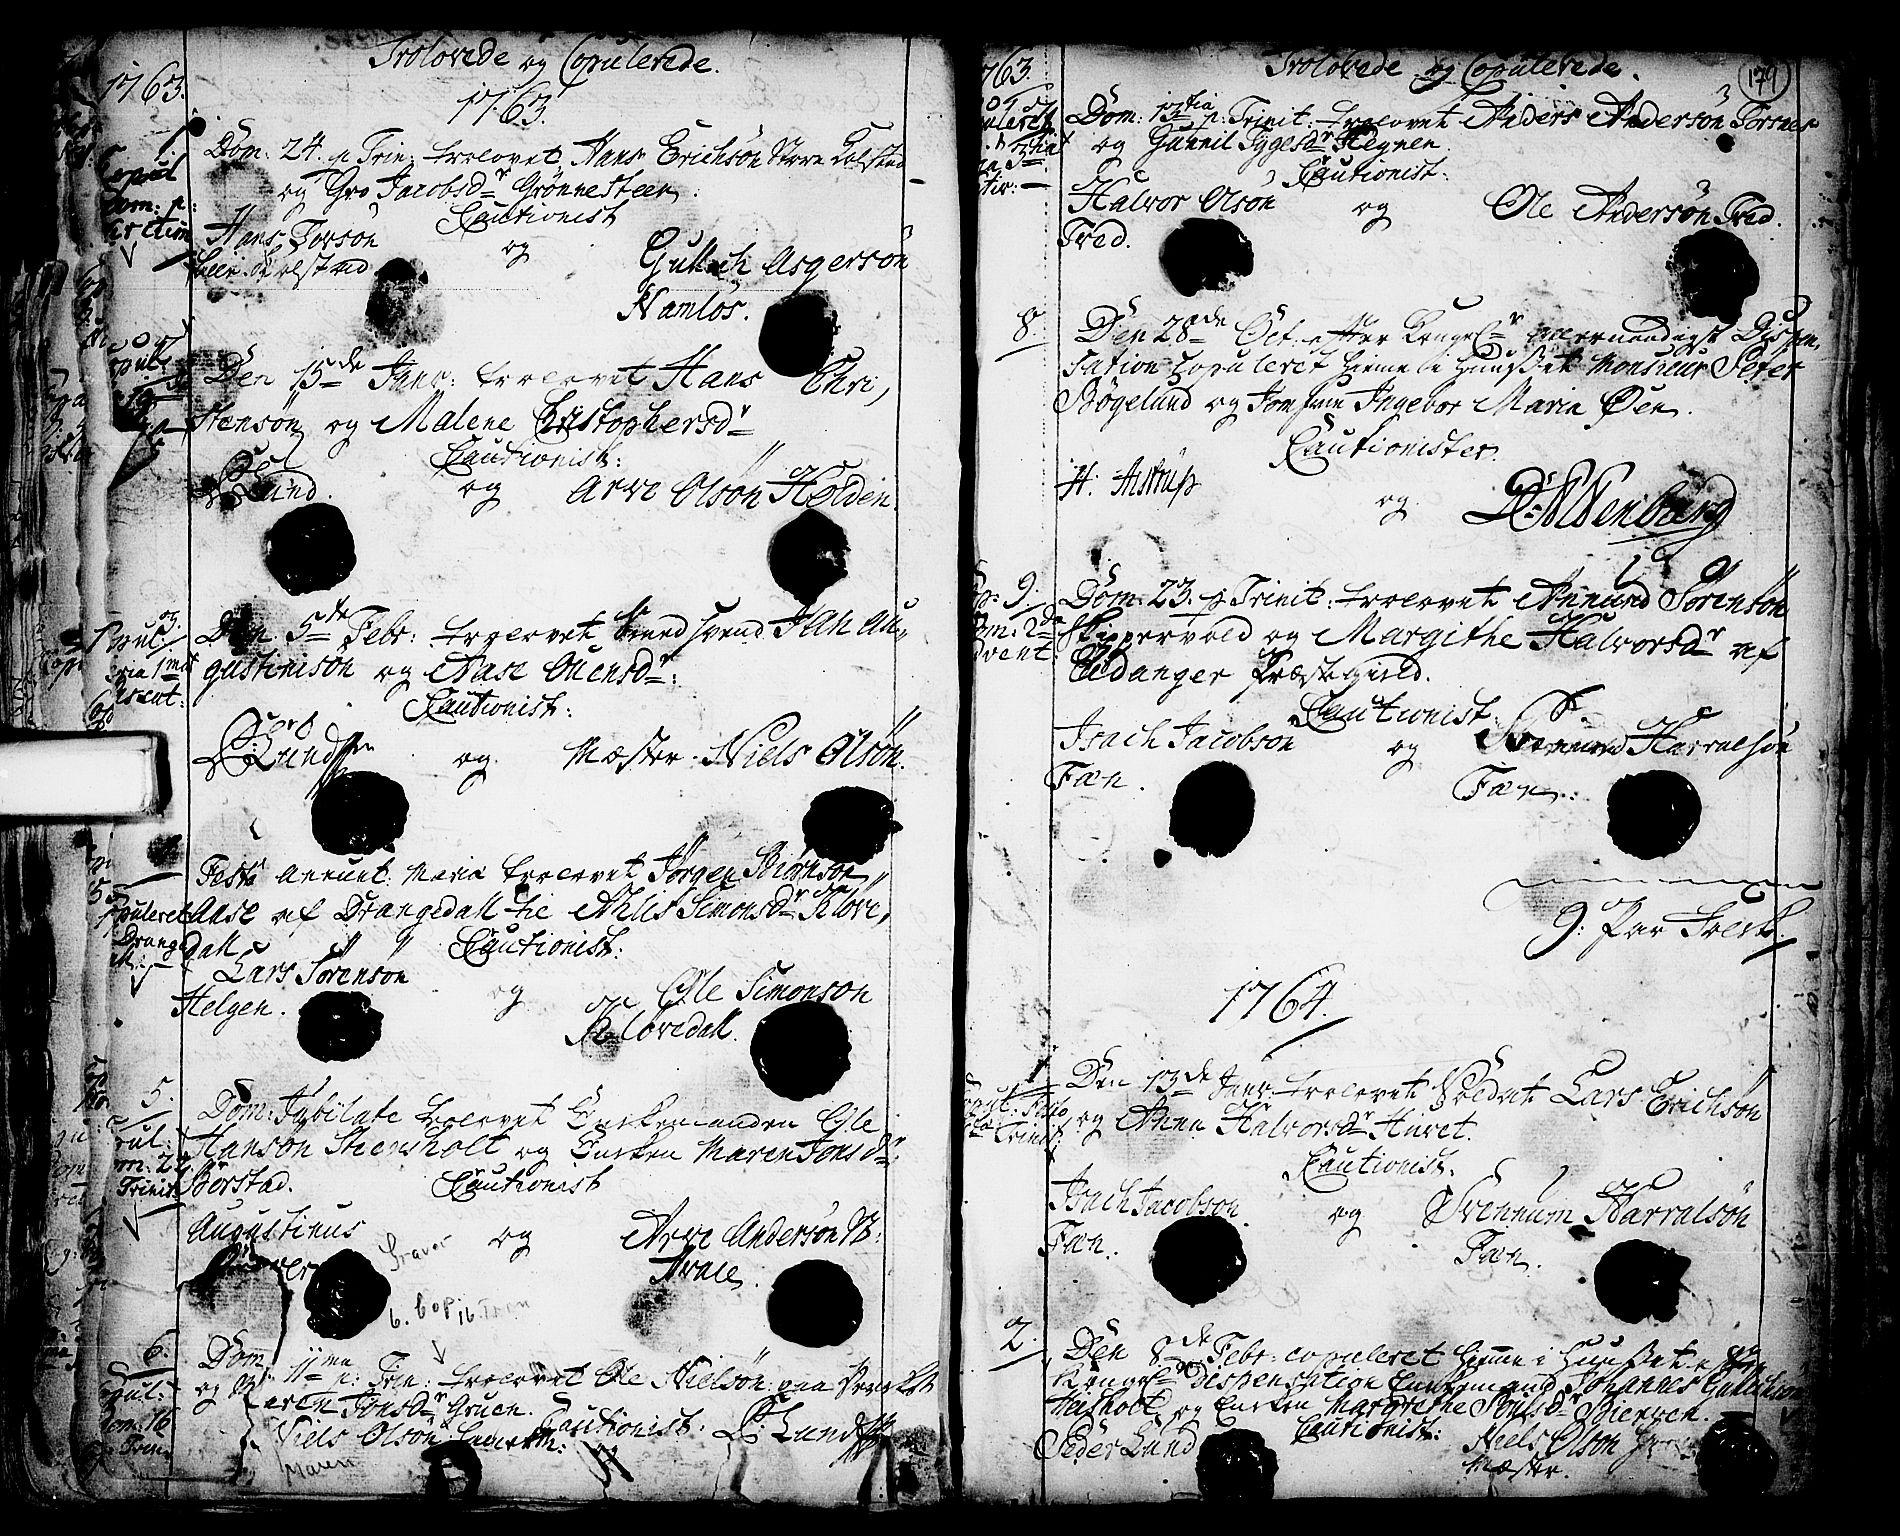 SAKO, Holla kirkebøker, F/Fa/L0001: Ministerialbok nr. 1, 1717-1779, s. 179